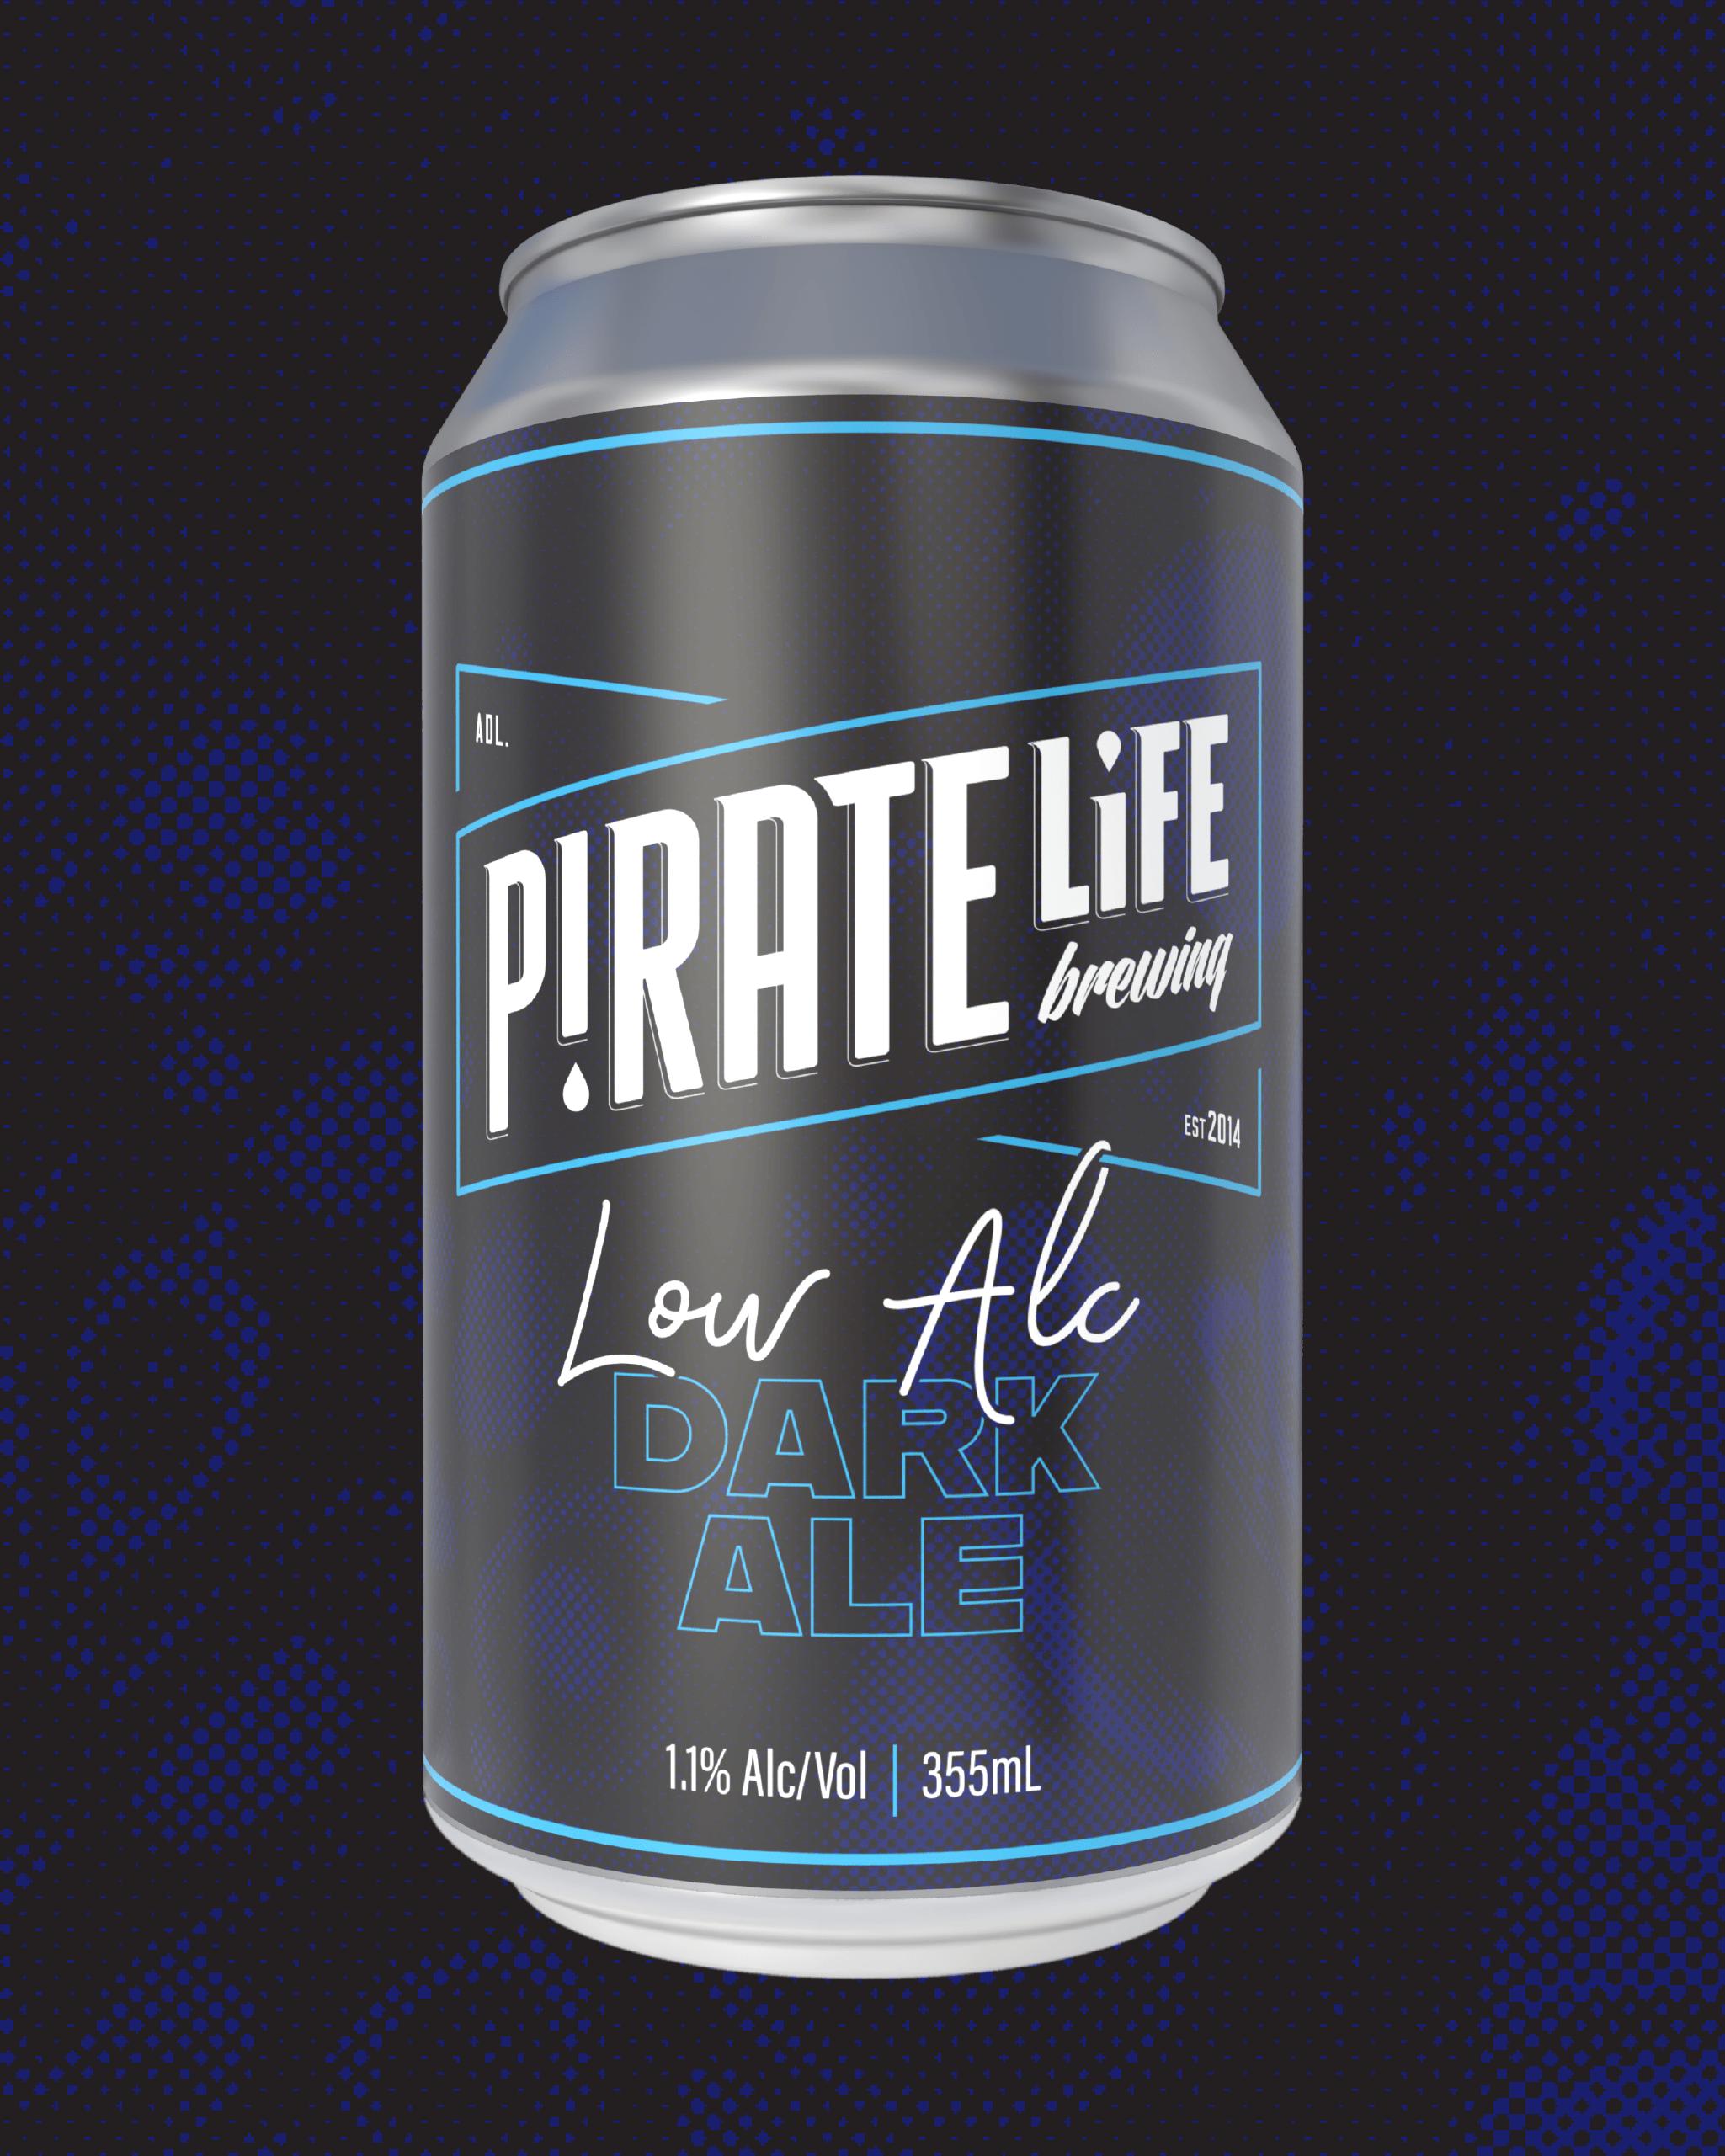 Low Alc Dark Ale